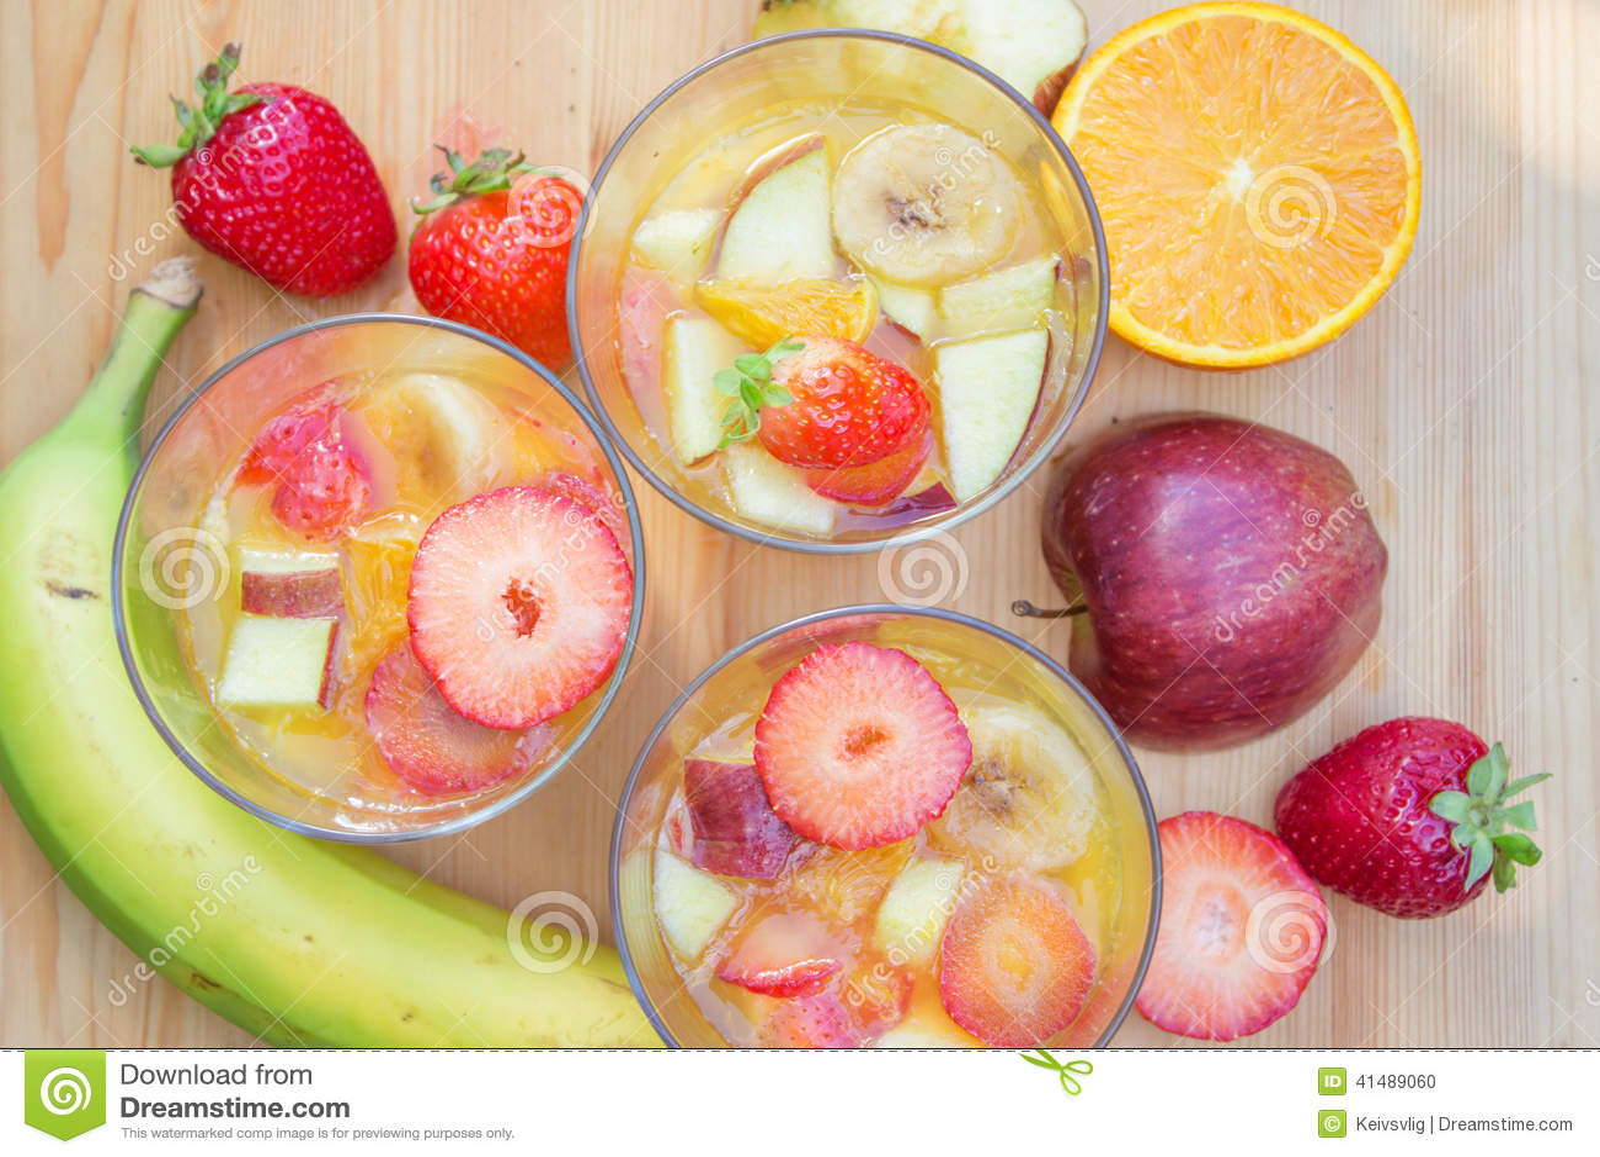 Using Fruit Baby Food For Fresh Fruit